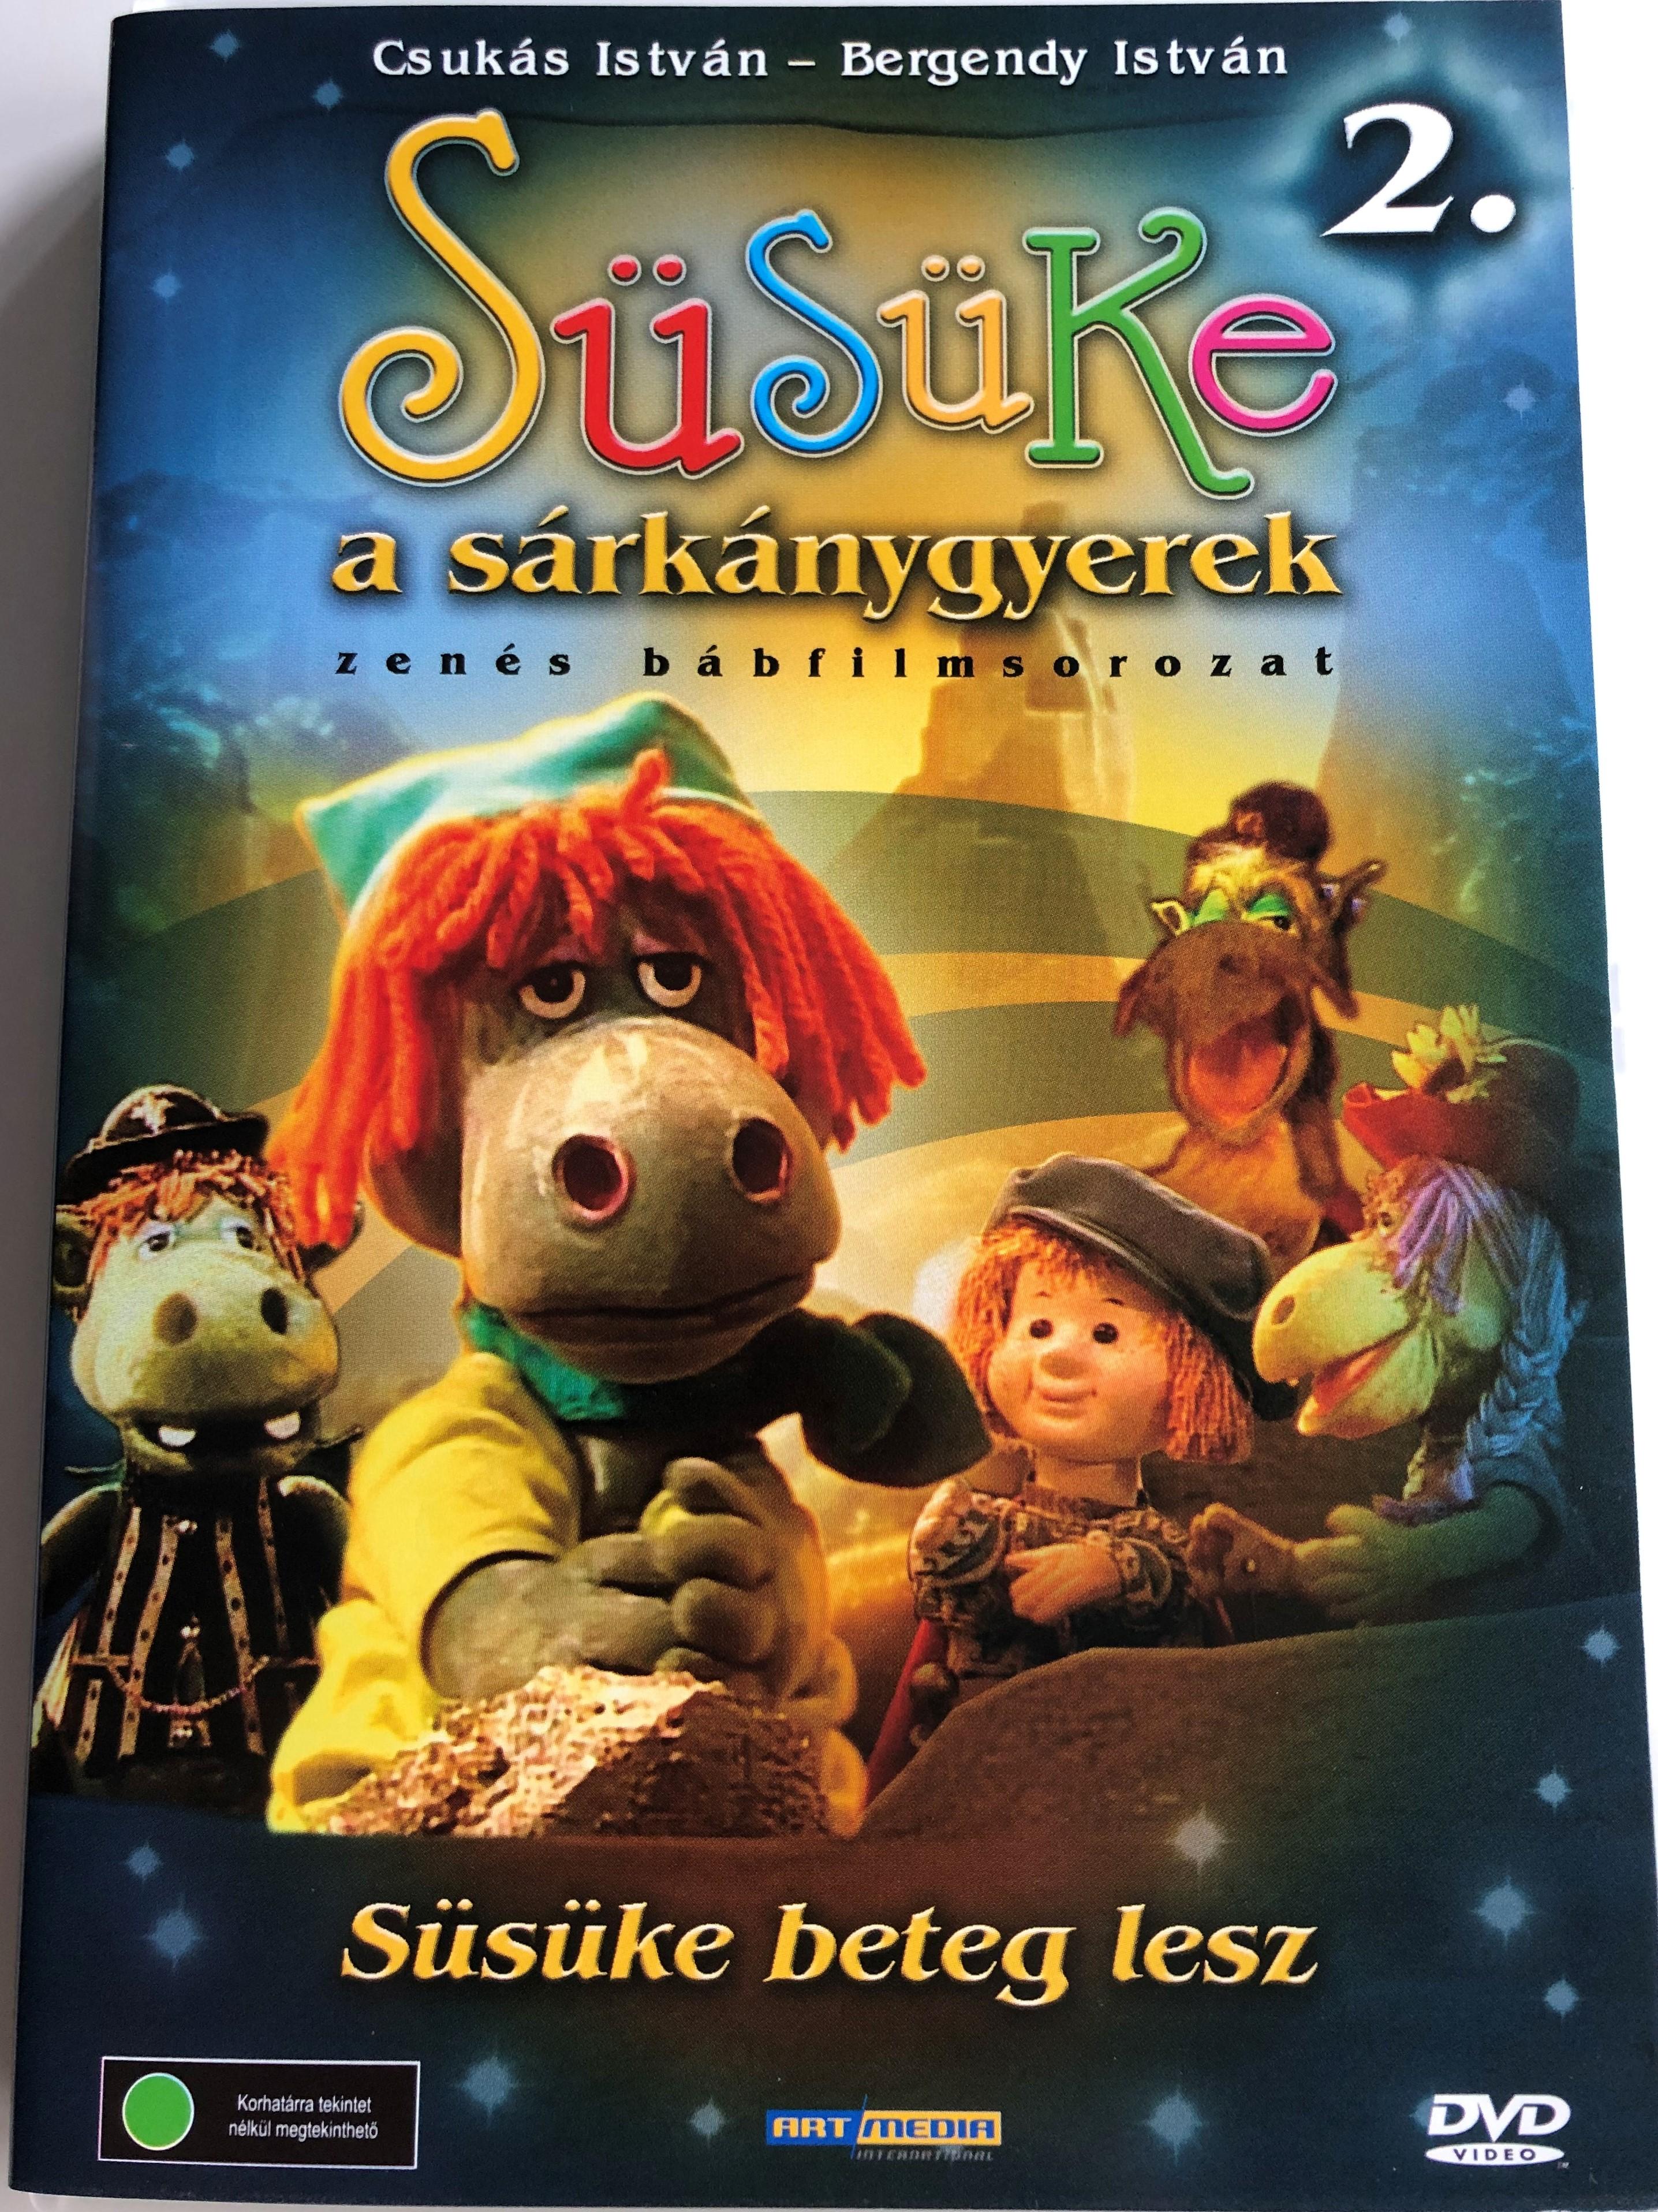 s-s-ke-a-s-rk-nygyerek-2.-dvd-2001-s-s-ke-beteg-lesz-1.jpg